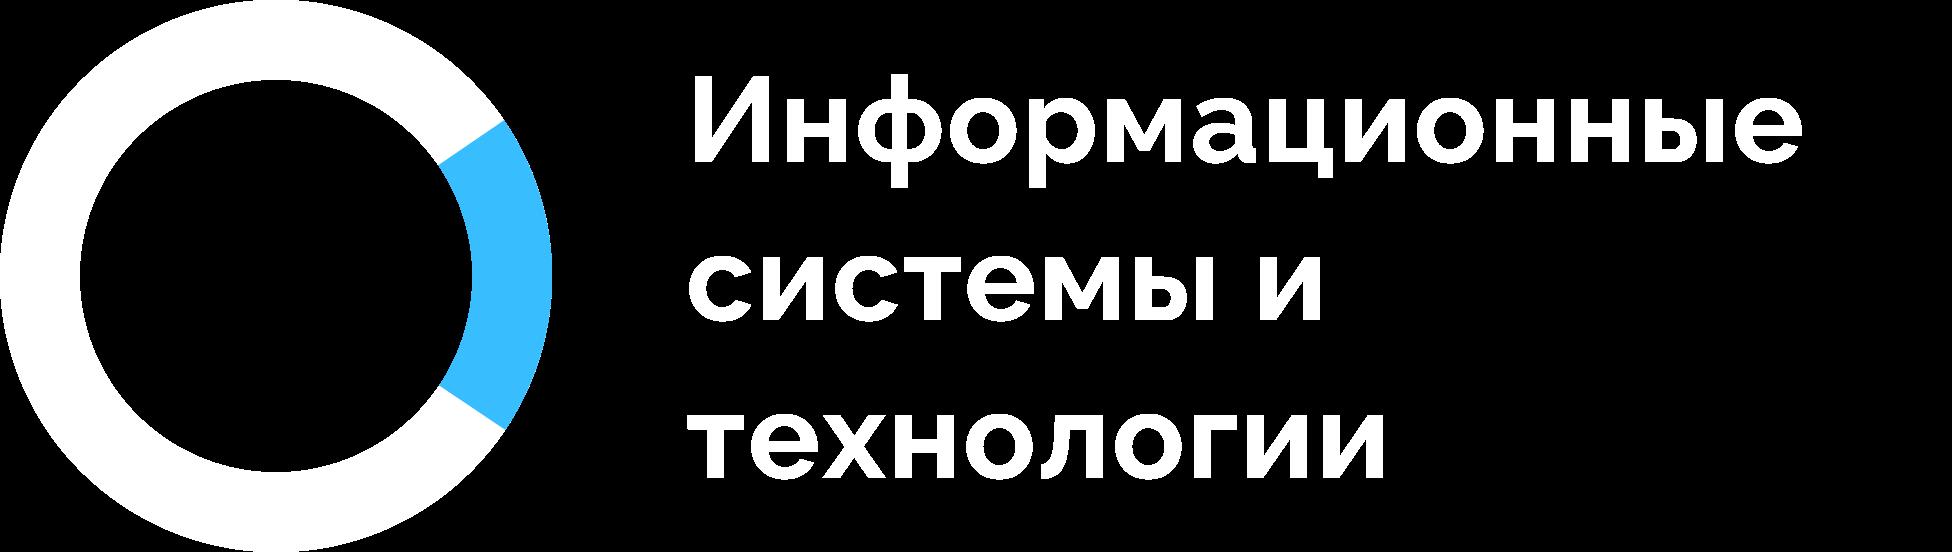 Кафедра ИСТ